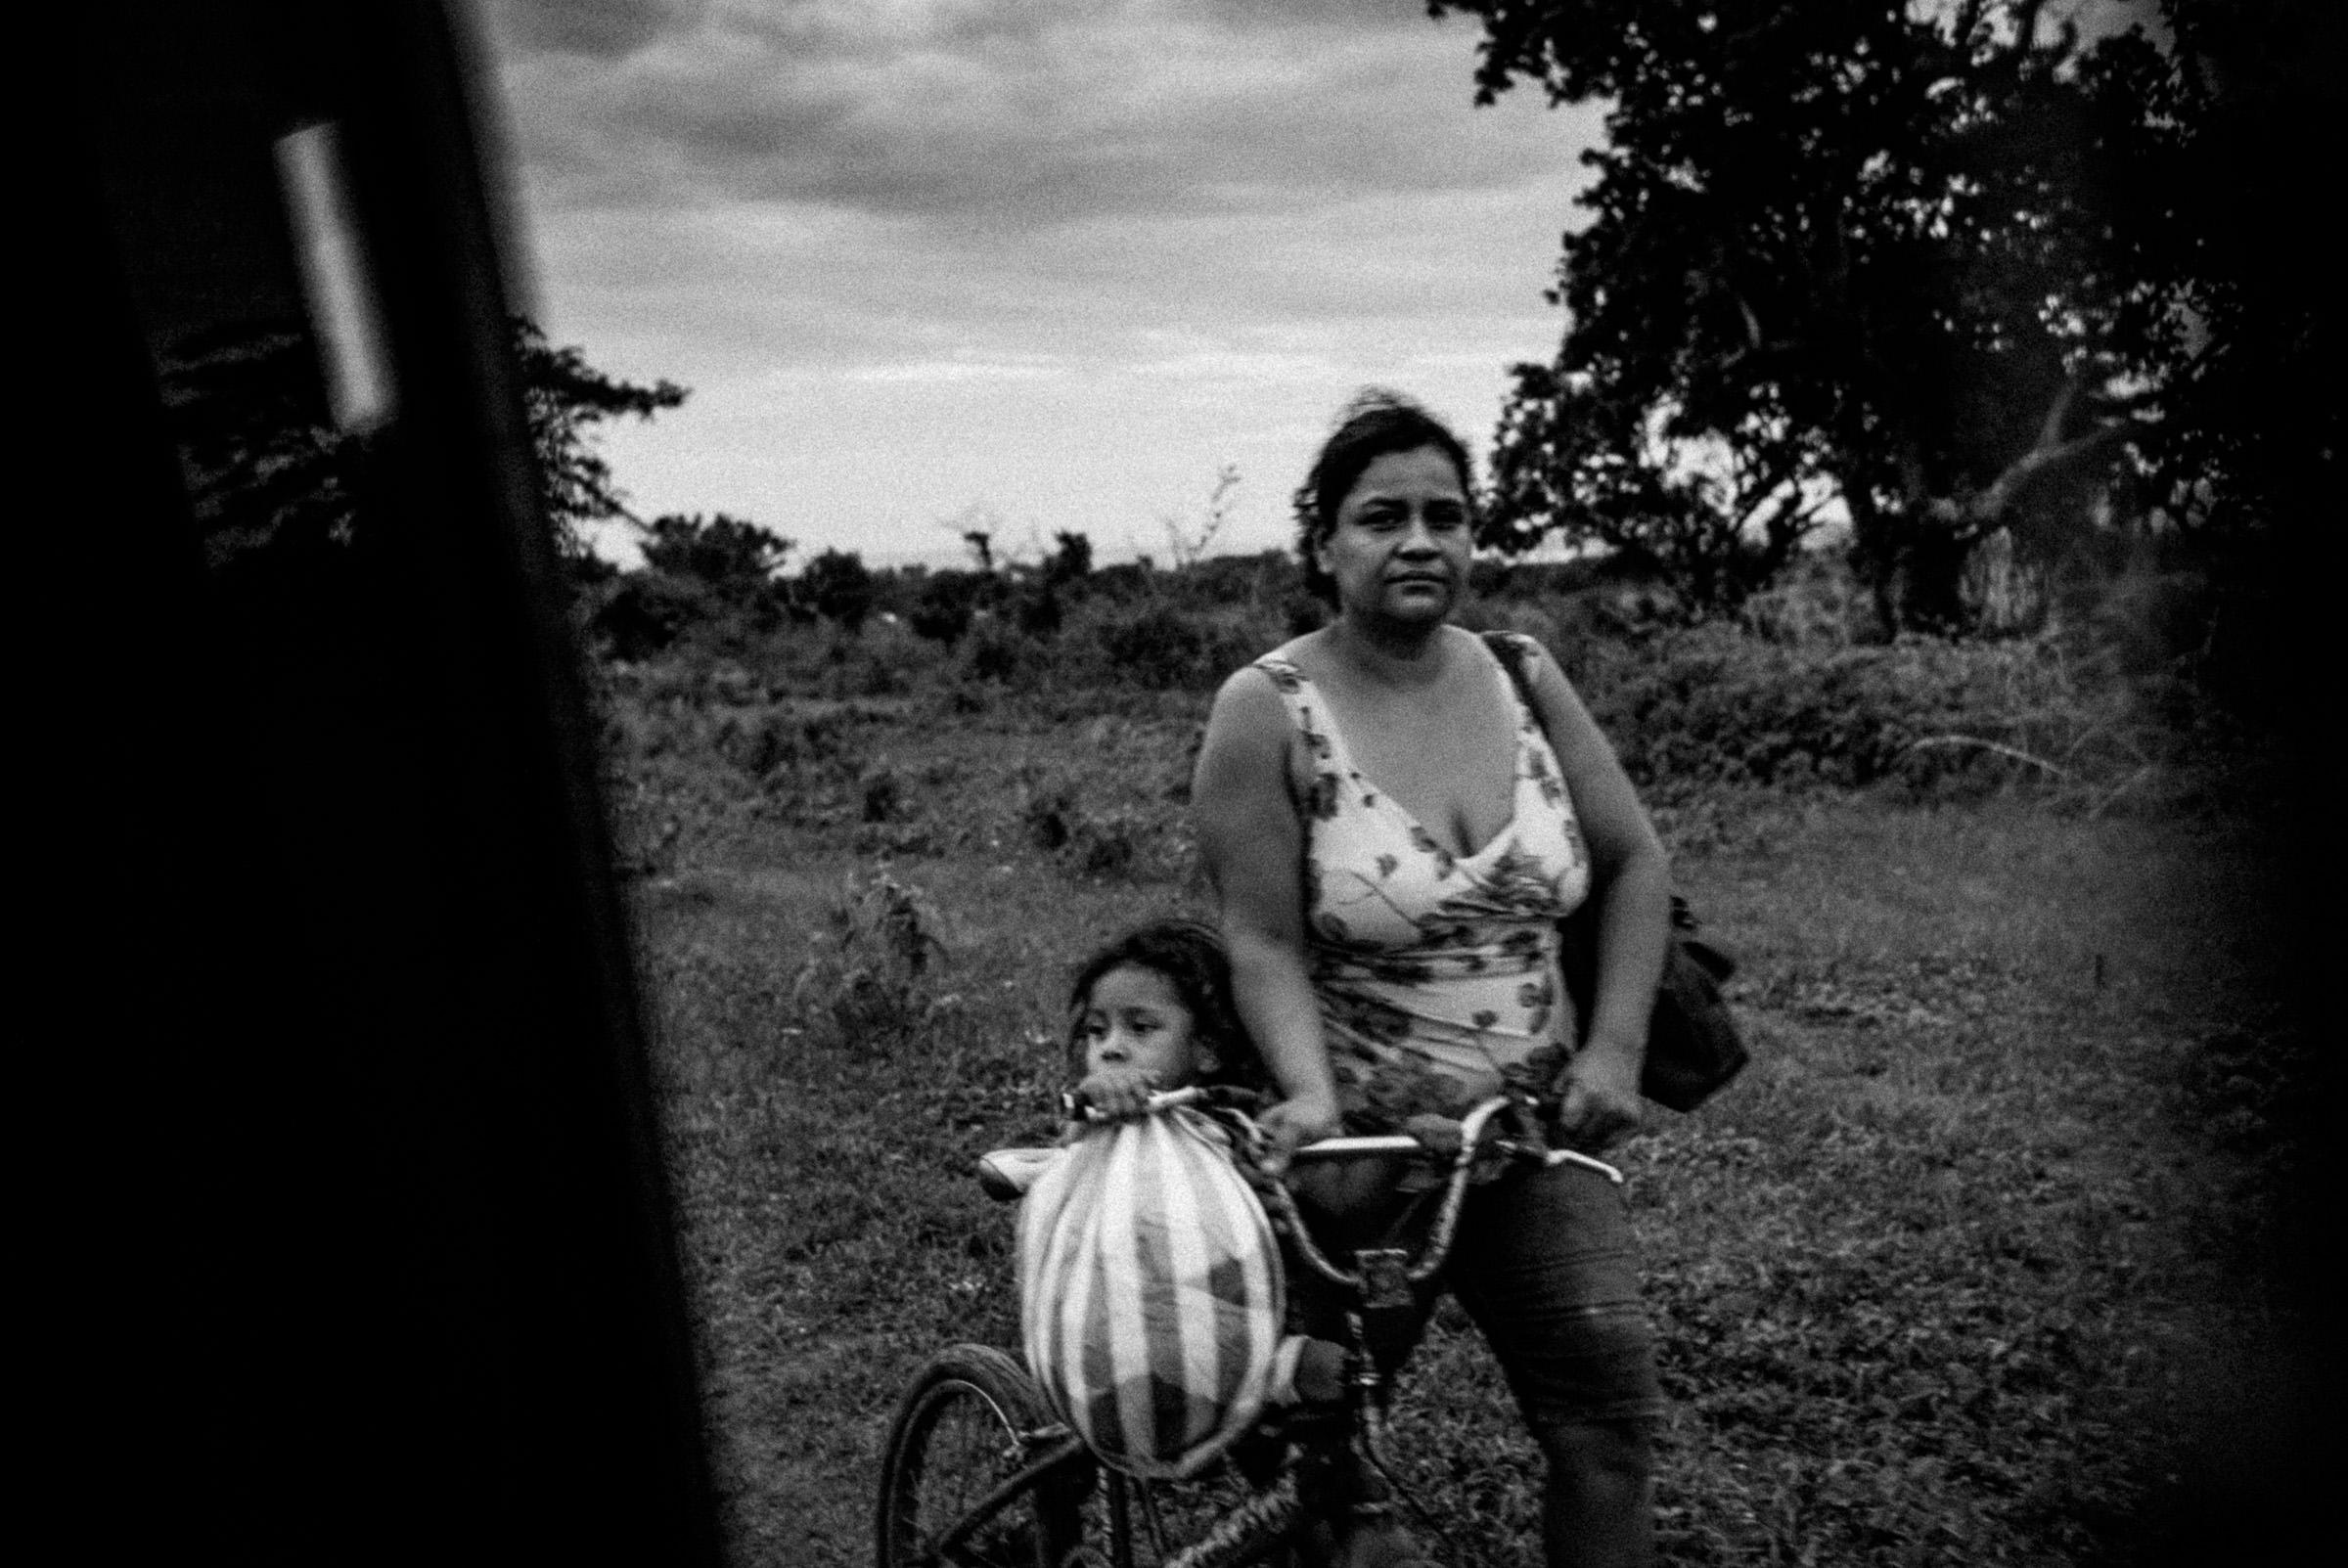 brandon_patoc_travel_photographer_in_nicaragua_0009.jpg